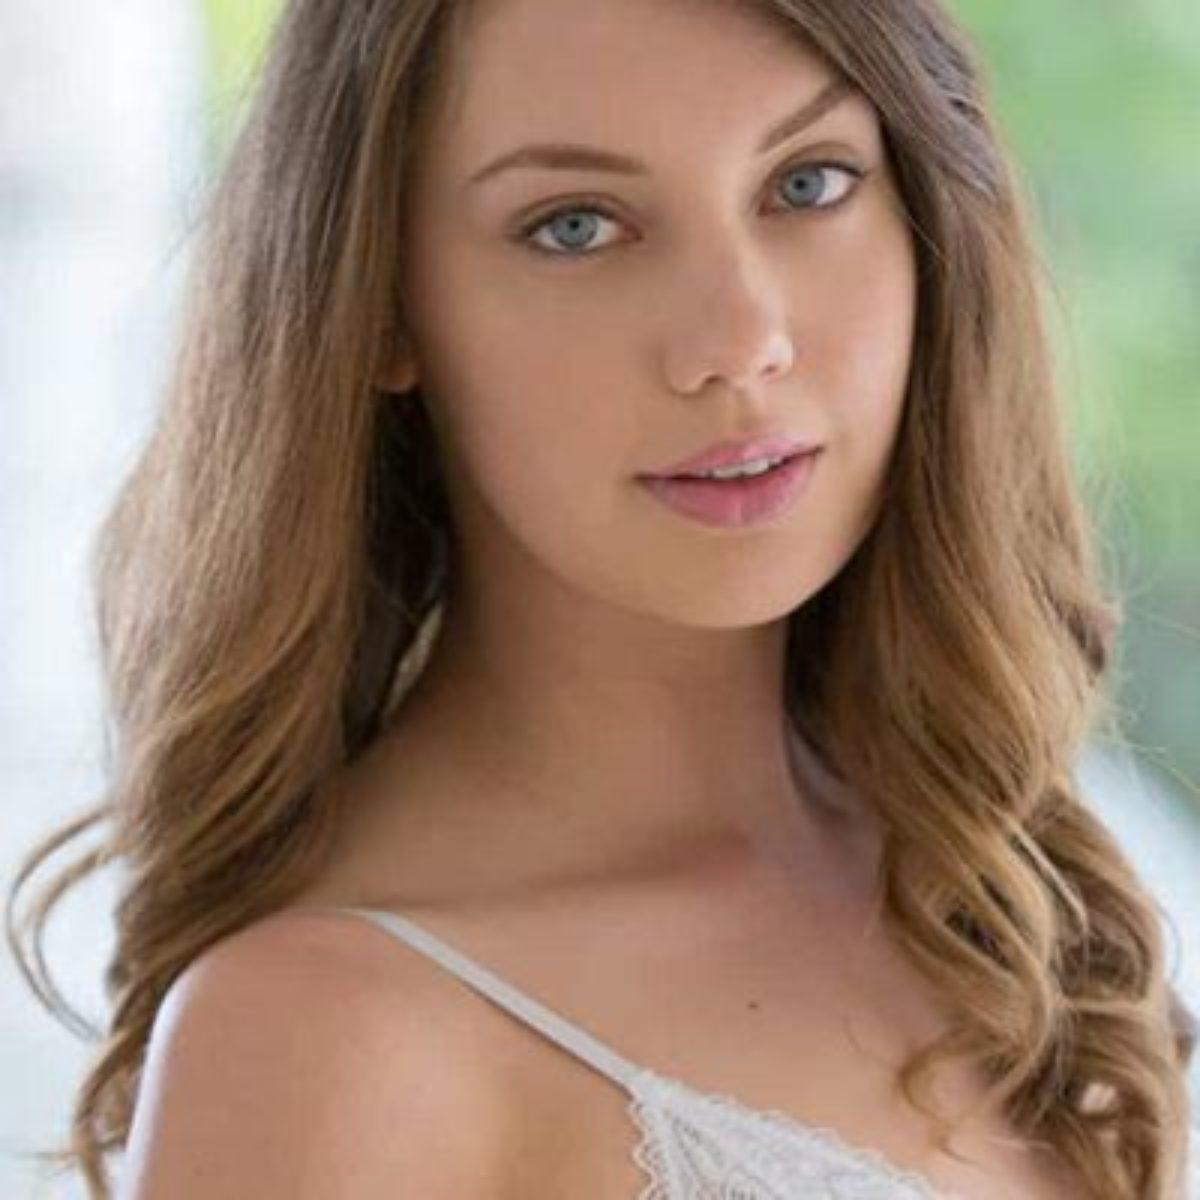 Elena koshka photo приглашаем моделей на работу